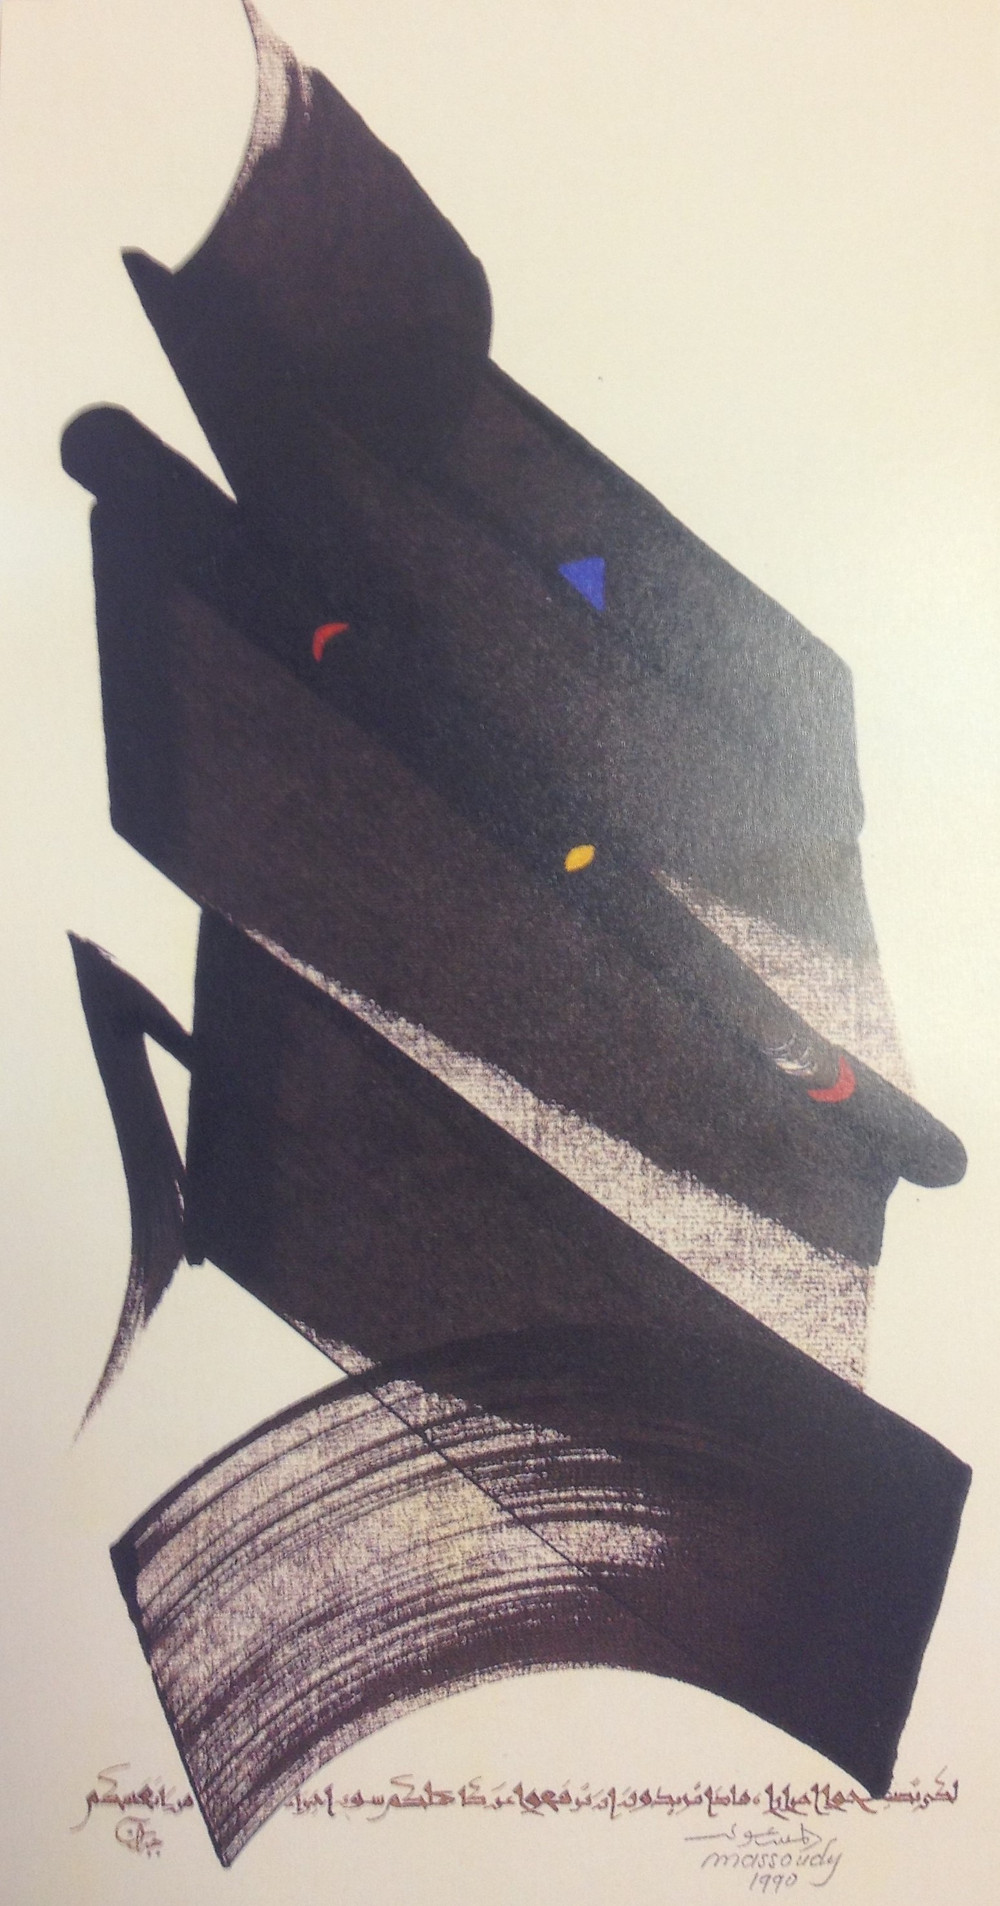 Calligraphie d'Hassan Massoudy - 1990